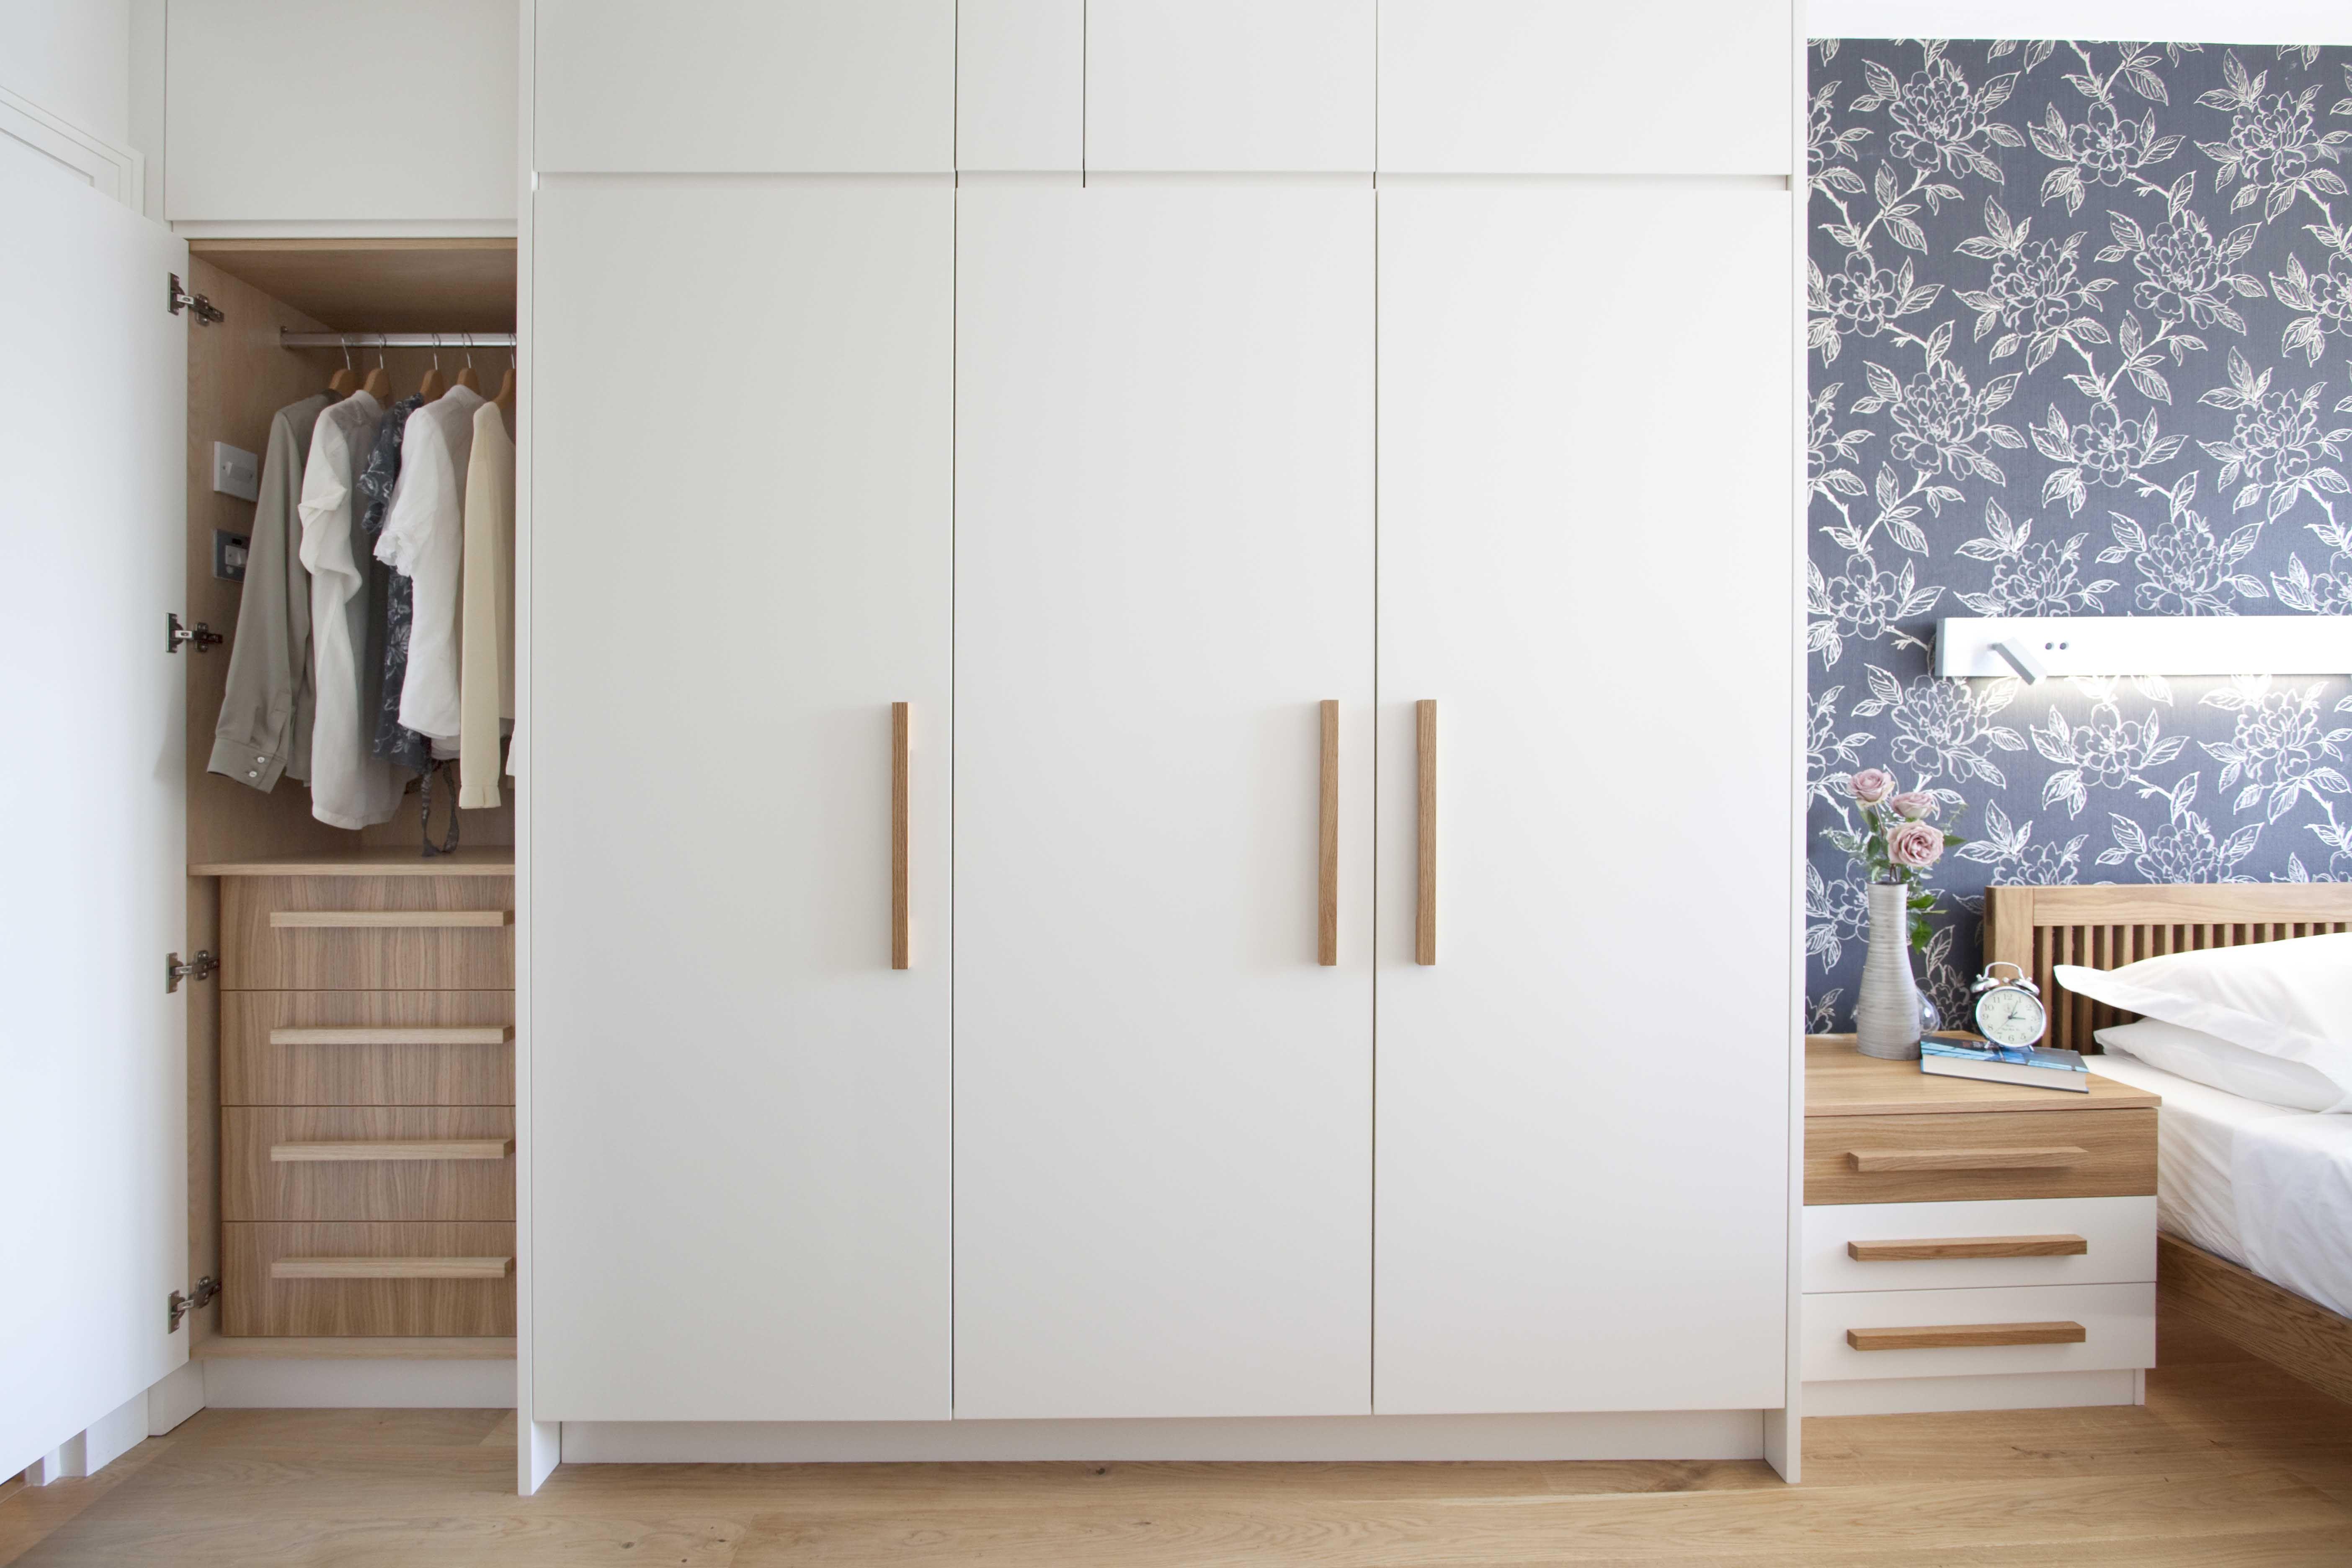 Fitted White Wardrobe Bespoke Cabinetry Wooden Increation Cupboard Design Bedroom Cupboard Designs Bedroom Cupboards